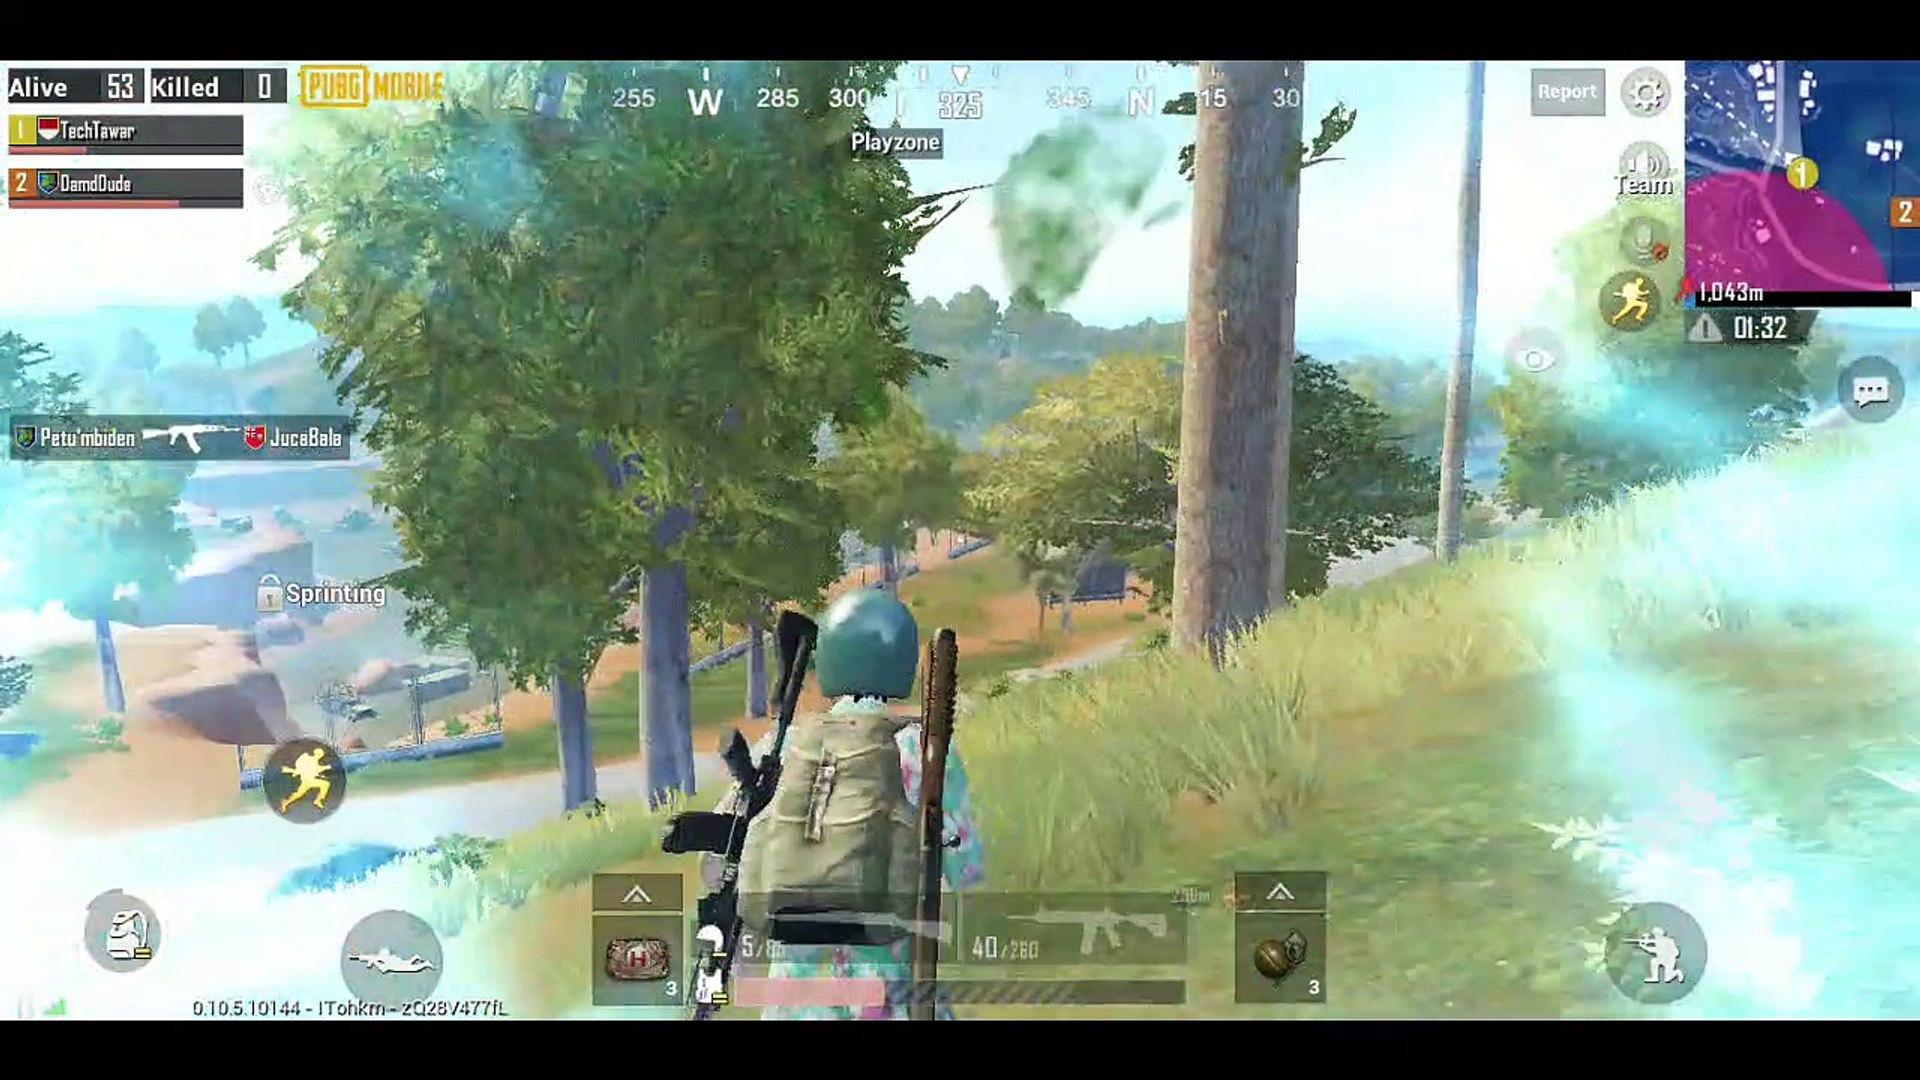 Duo Trout Dut Reverse Sanhok Map PUBG Mobile